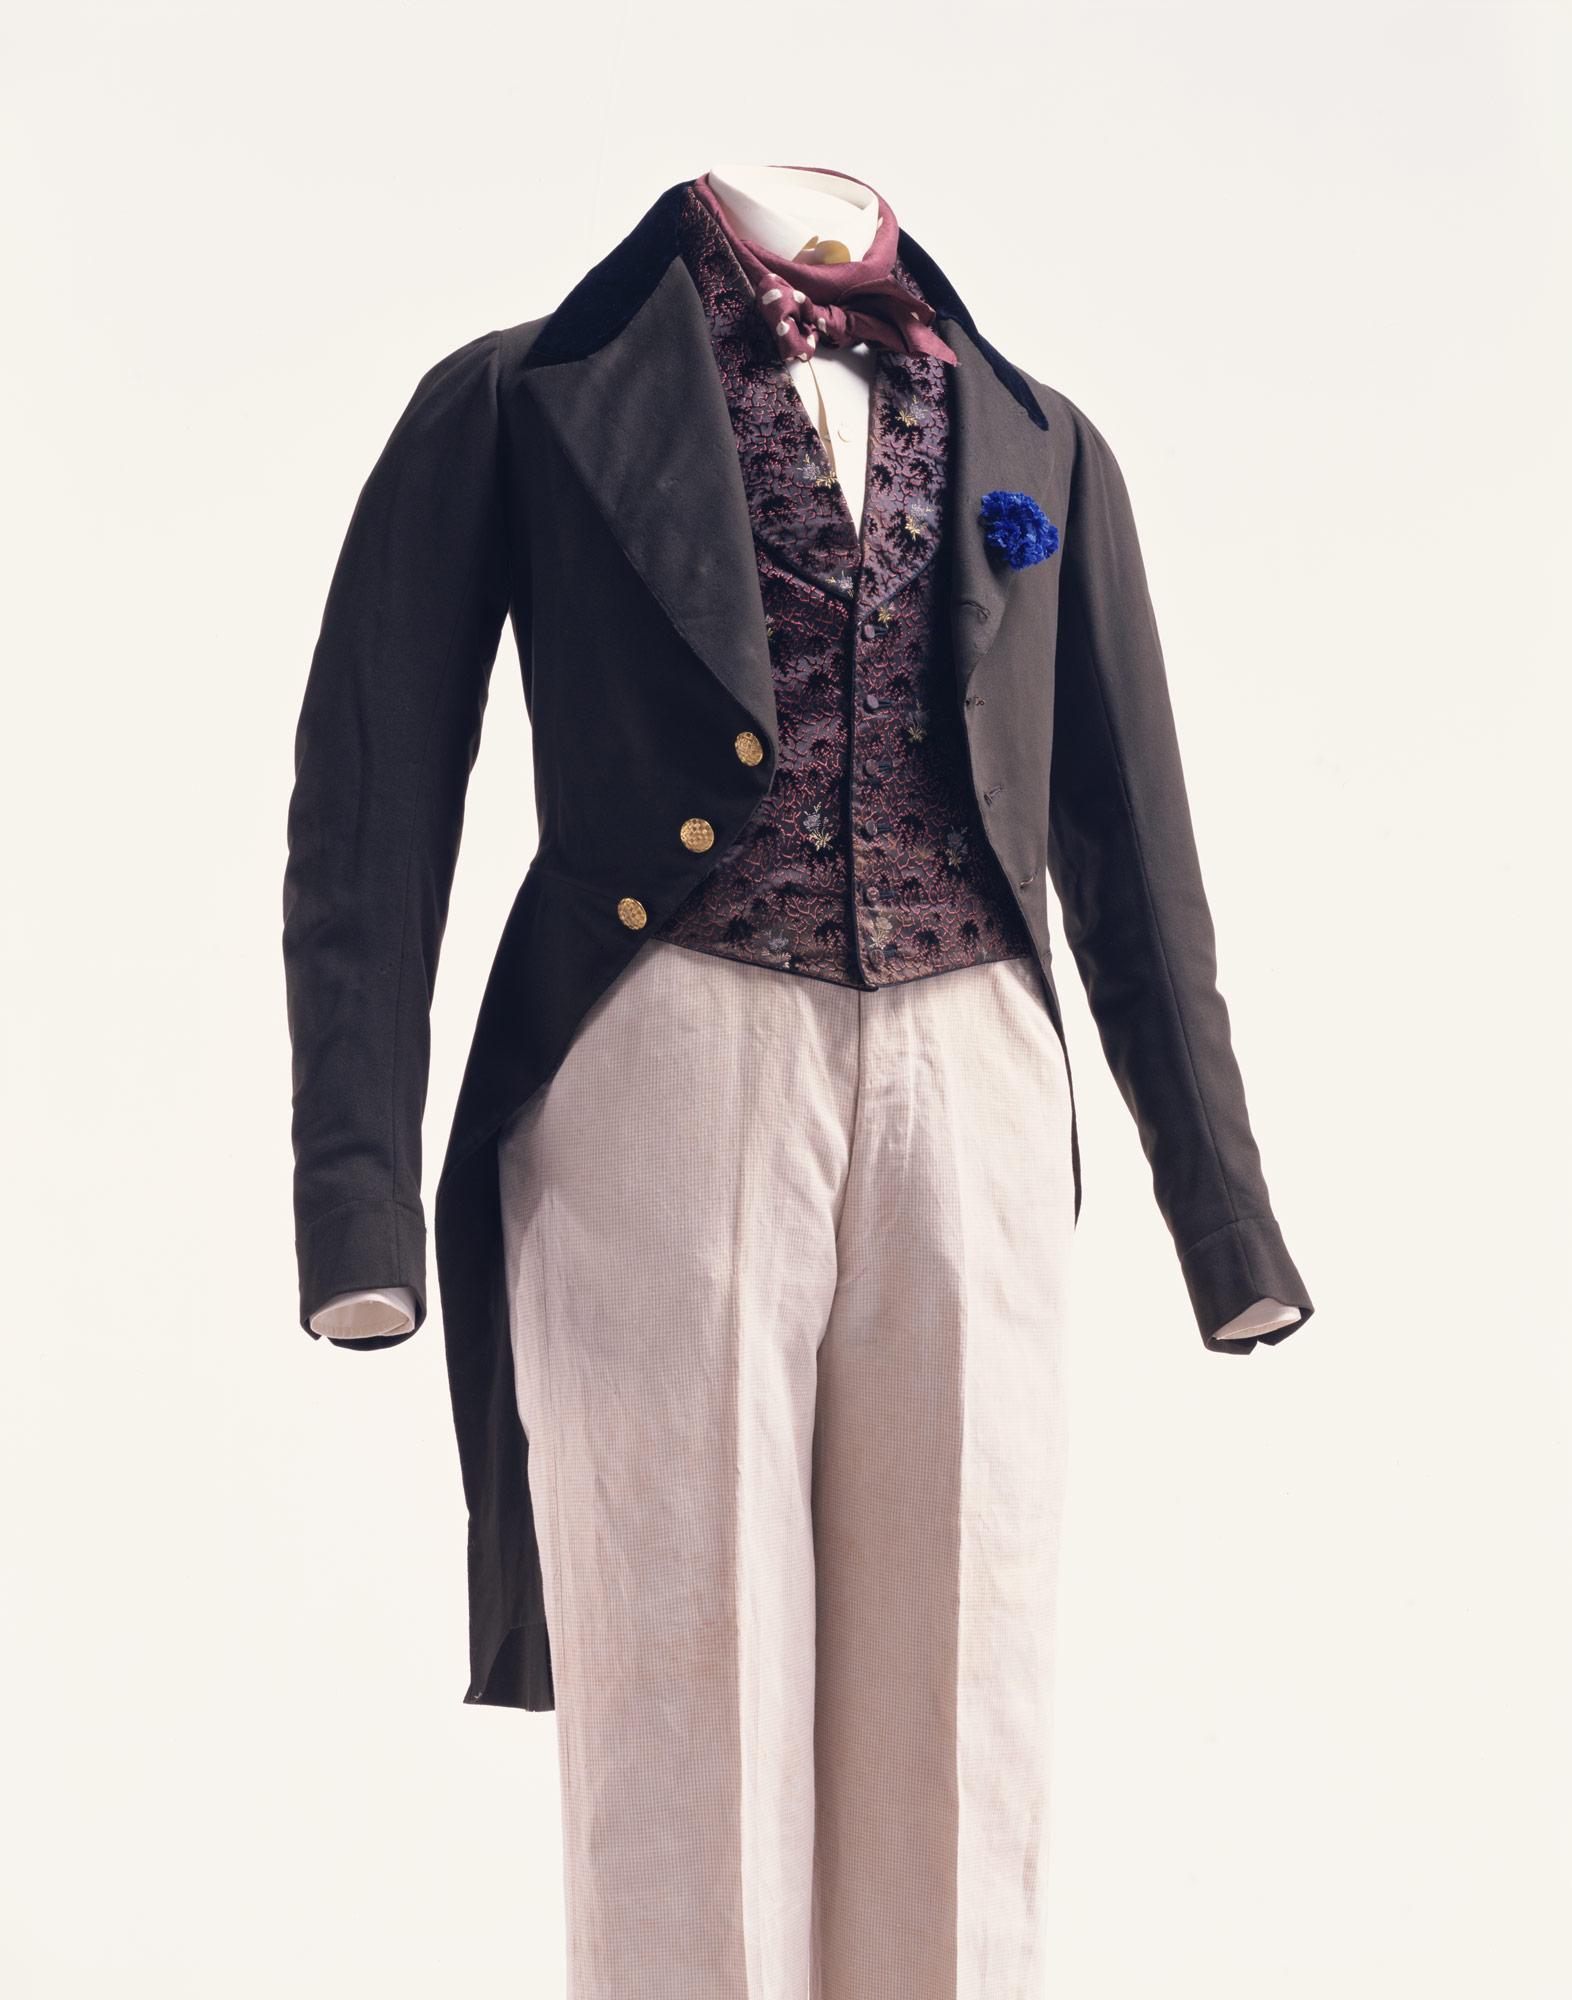 Men's Fashion During The Regency Era (1810s To 1830s